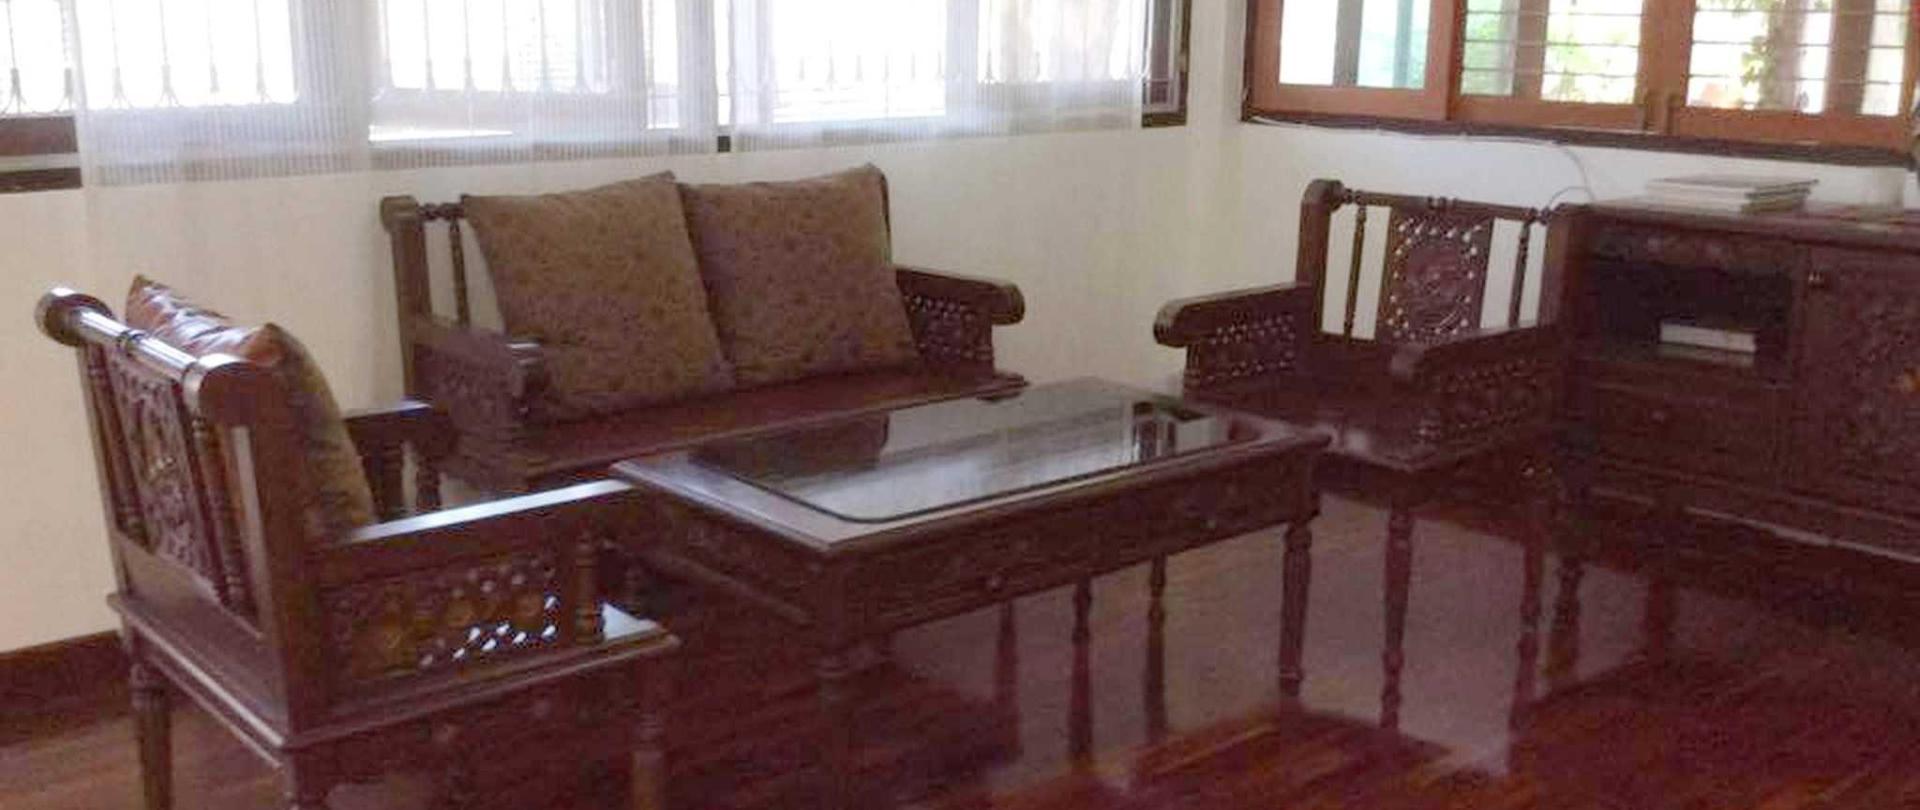 lobby-chair1-enlarge-vdo.jpg